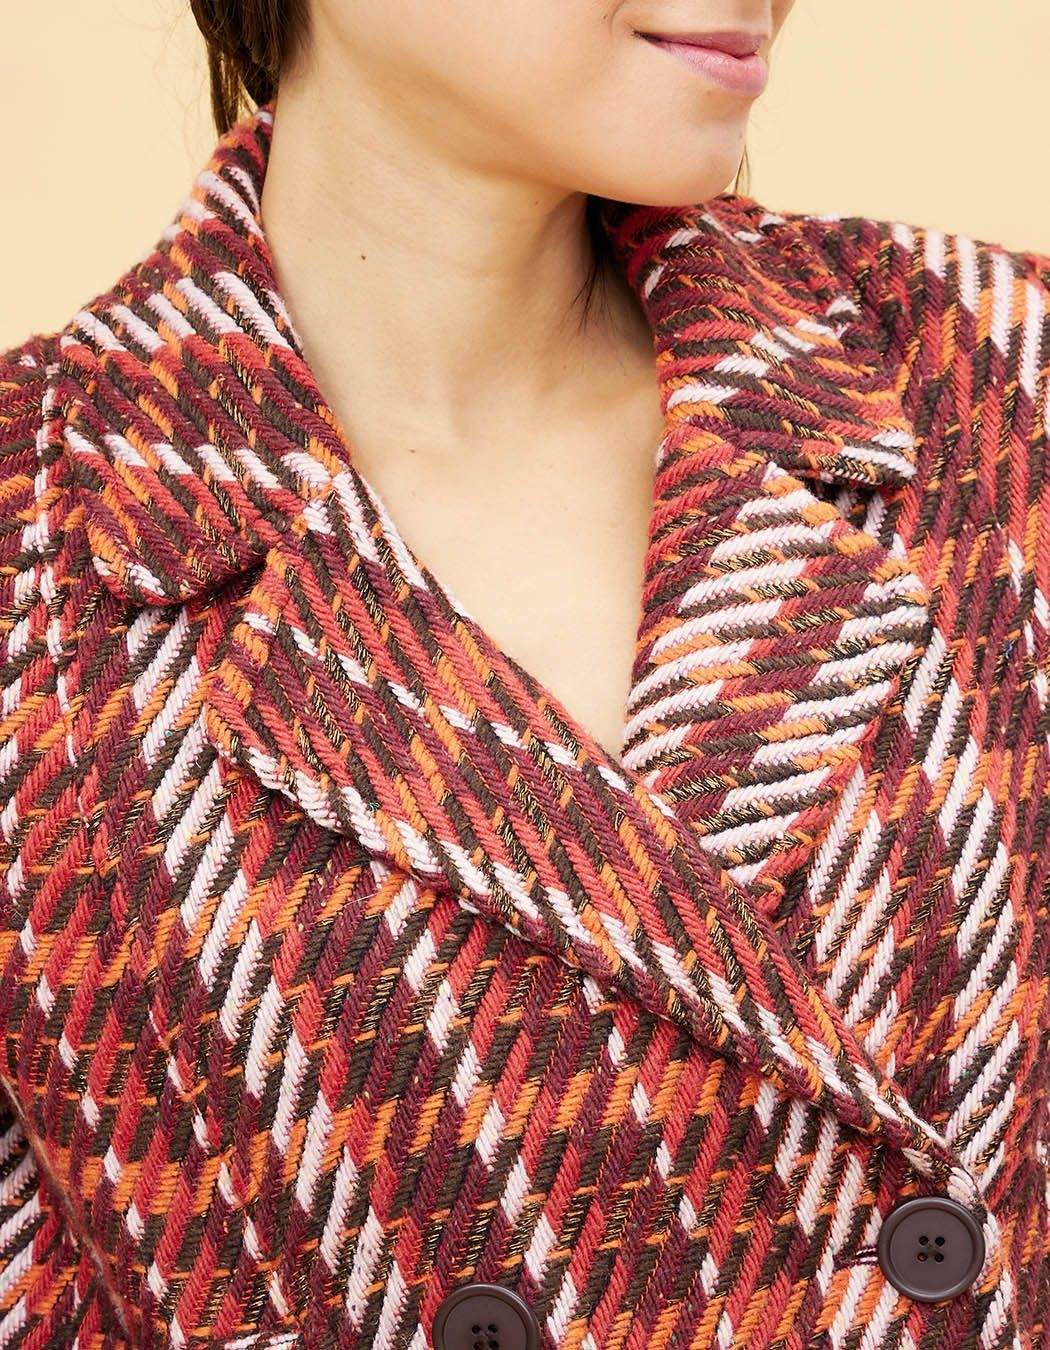 Manteau court en tweed La Fiancée du Mékong, Nais tweed sienne